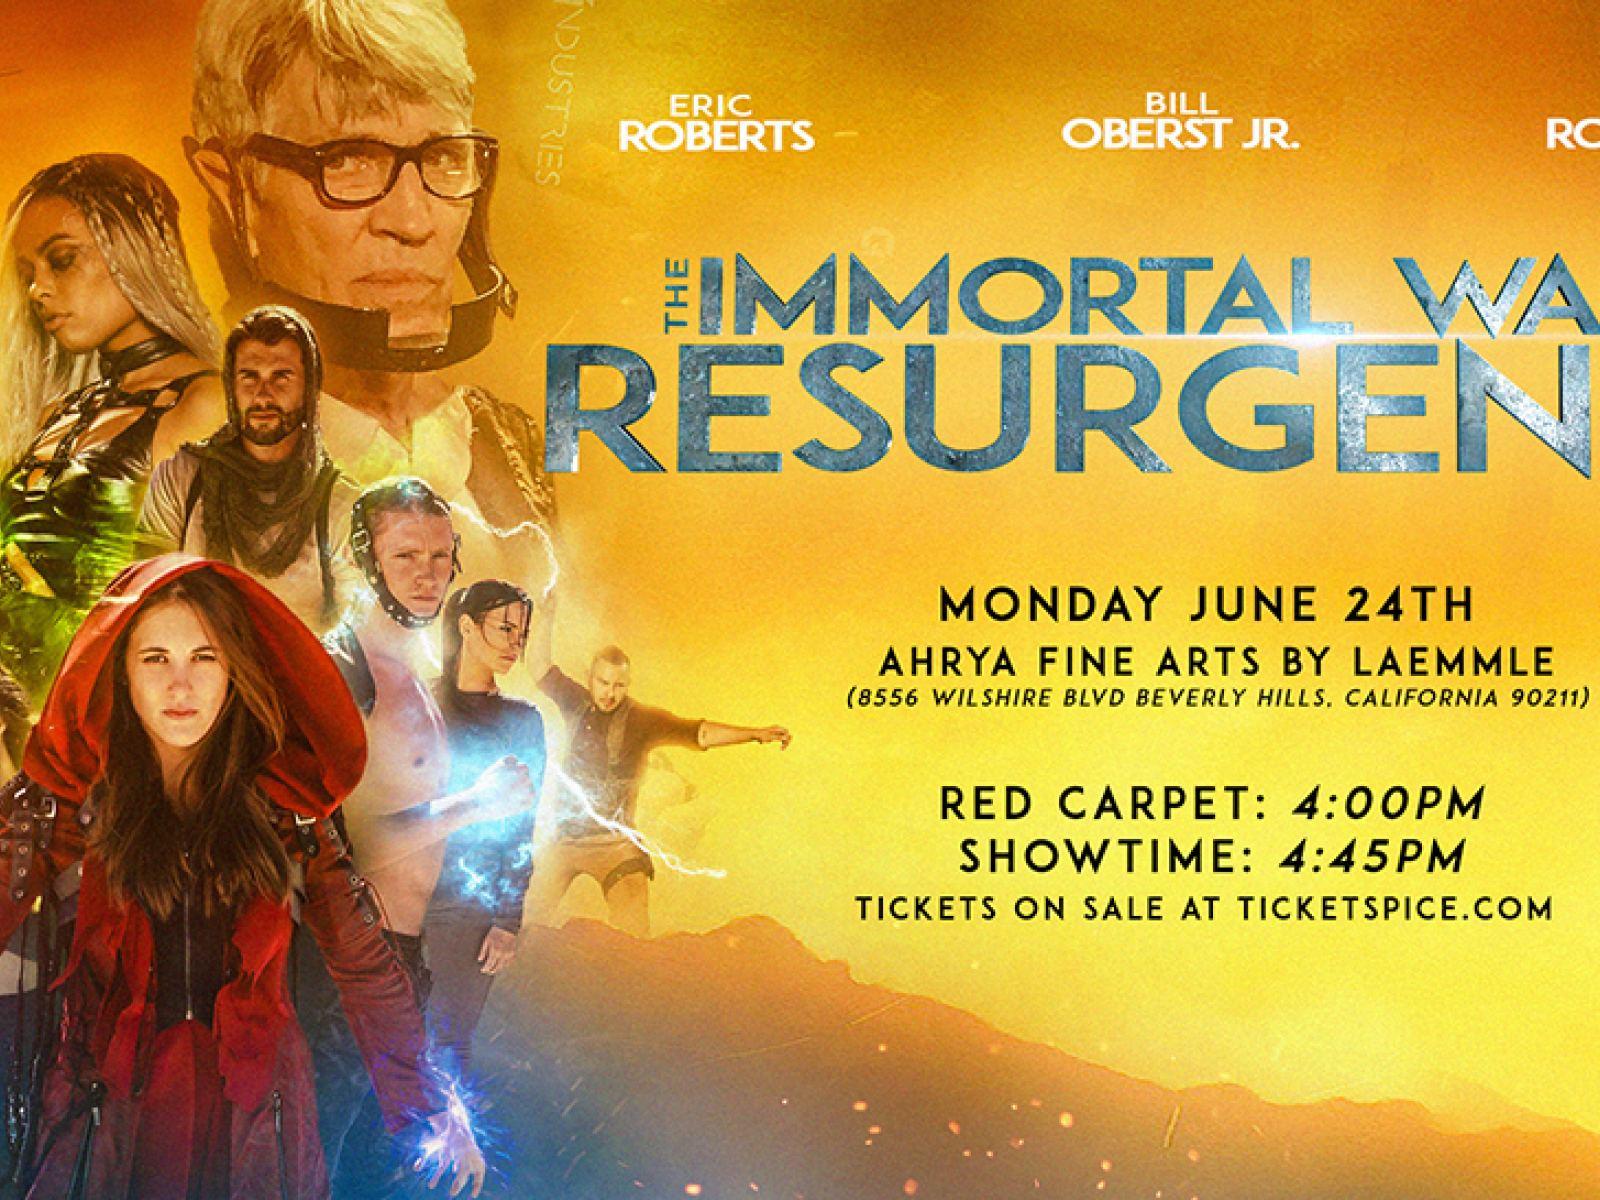 The Immortal Wars 2 - Los Angeles Premiere